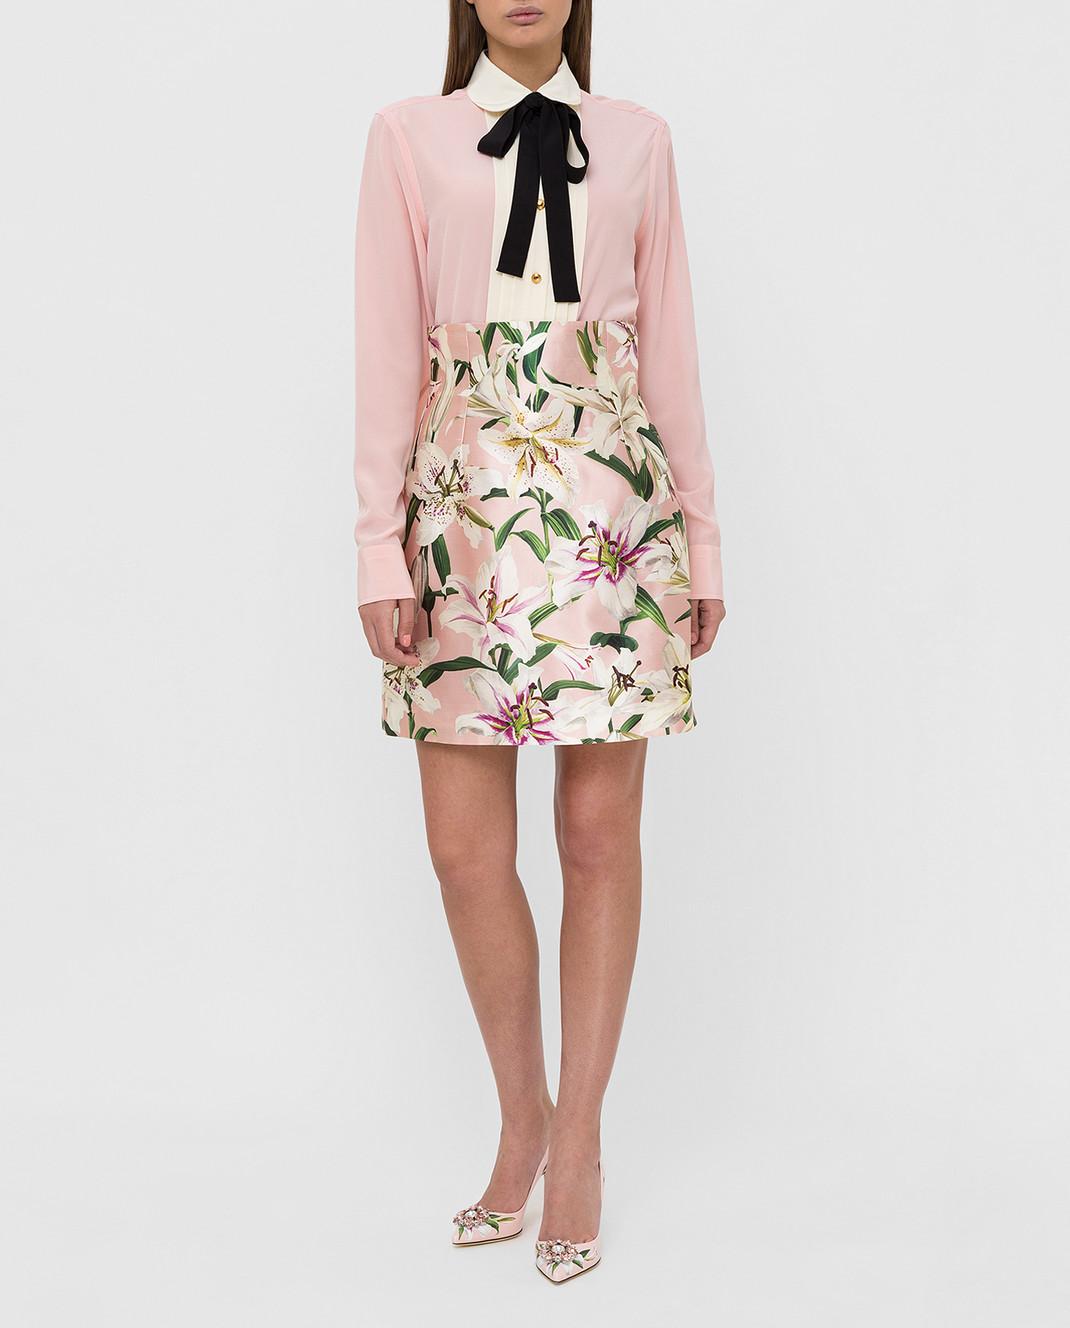 Dolce&Gabbana Розовая юбка из шелка F4BOLTHS149 изображение 2